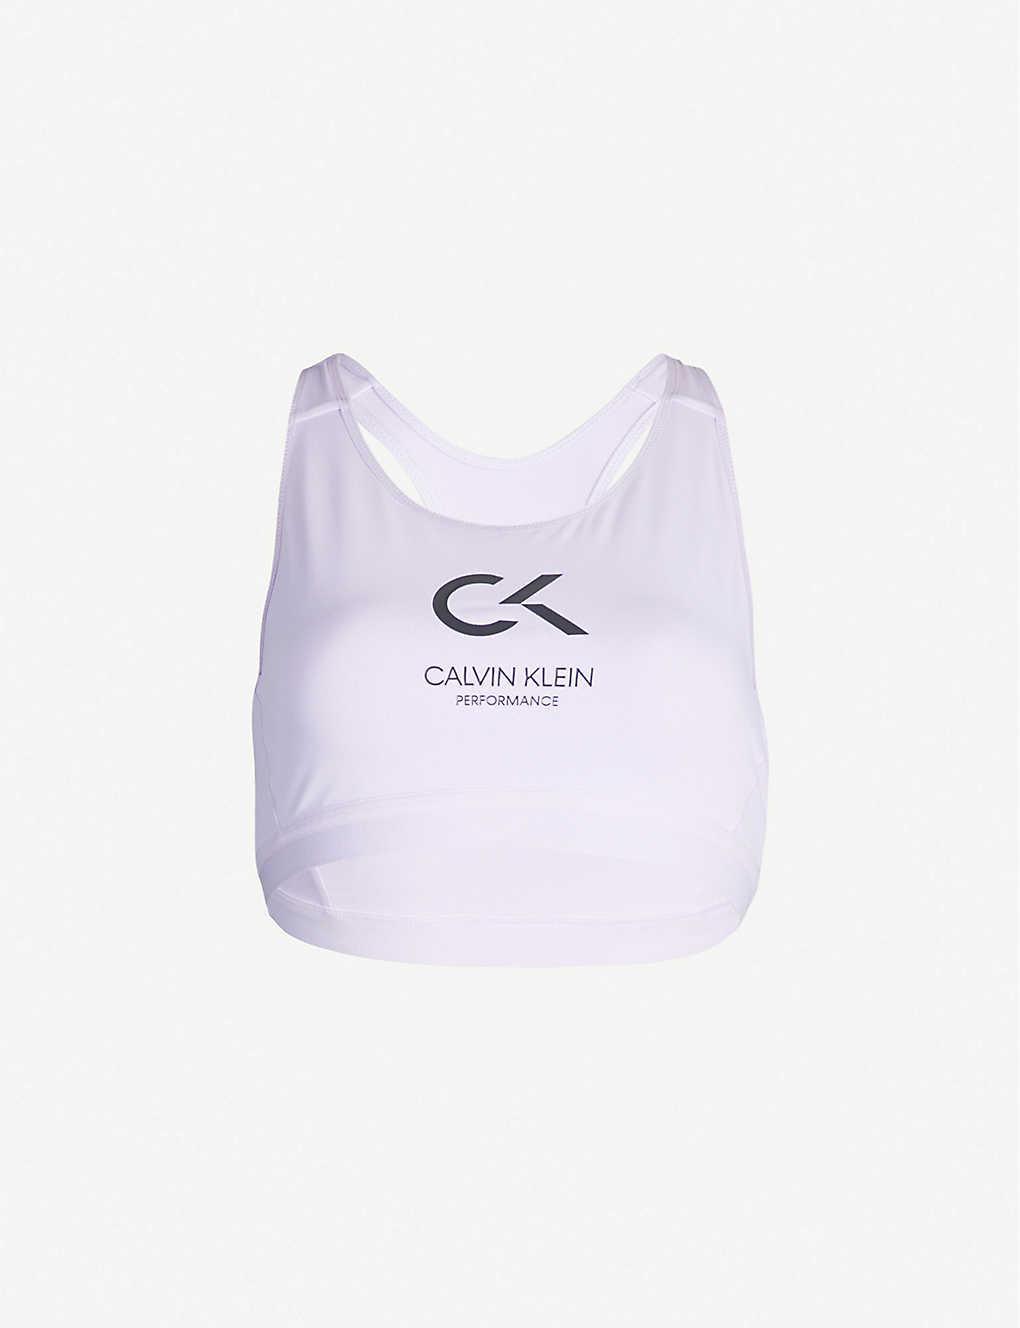 77fe22dee289 CALVIN KLEIN - Performance logo-print sports bra | Selfridges.com